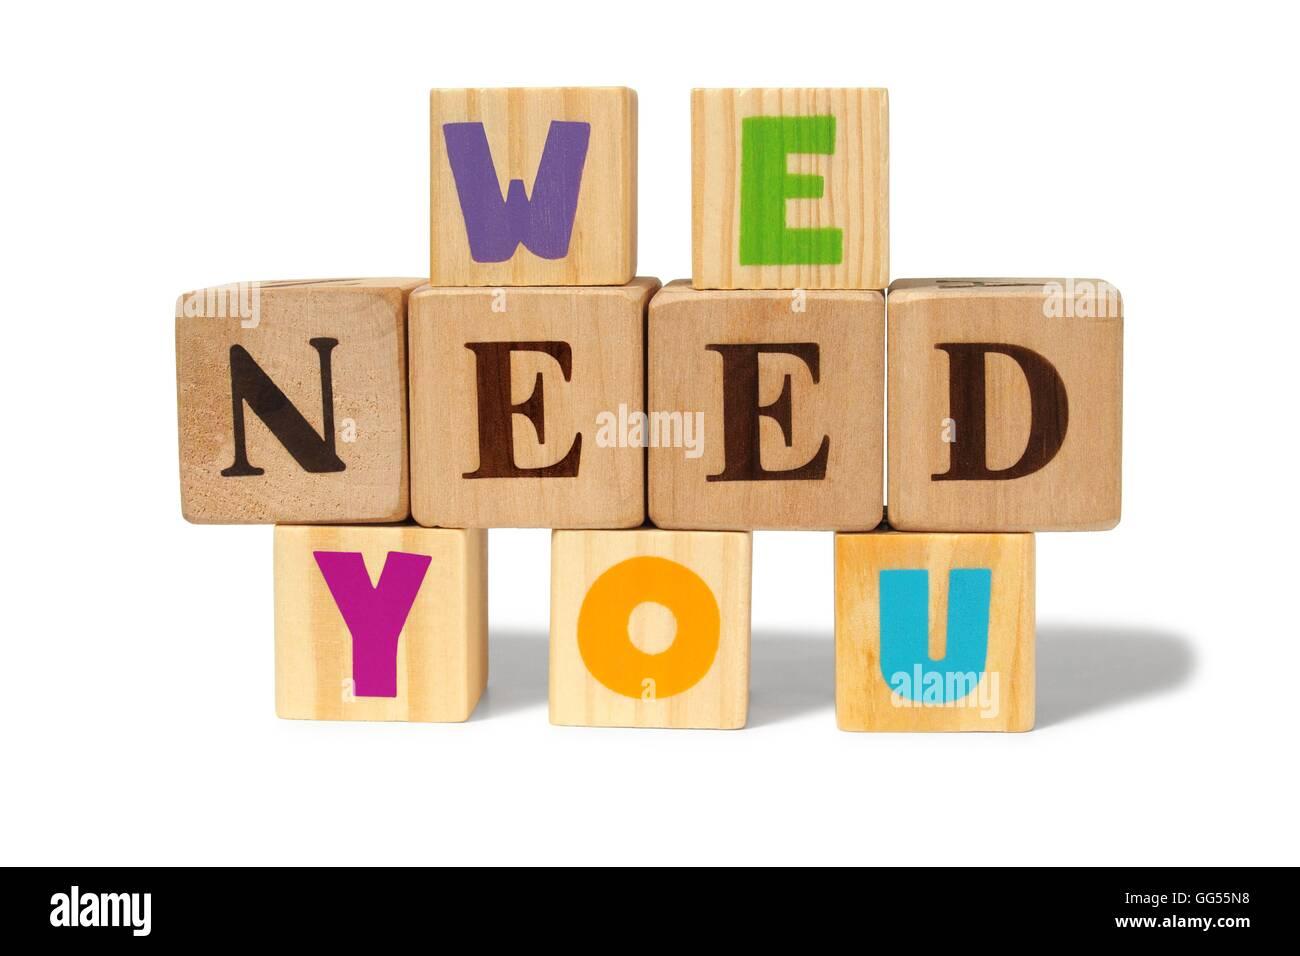 We need you message - Stock Image